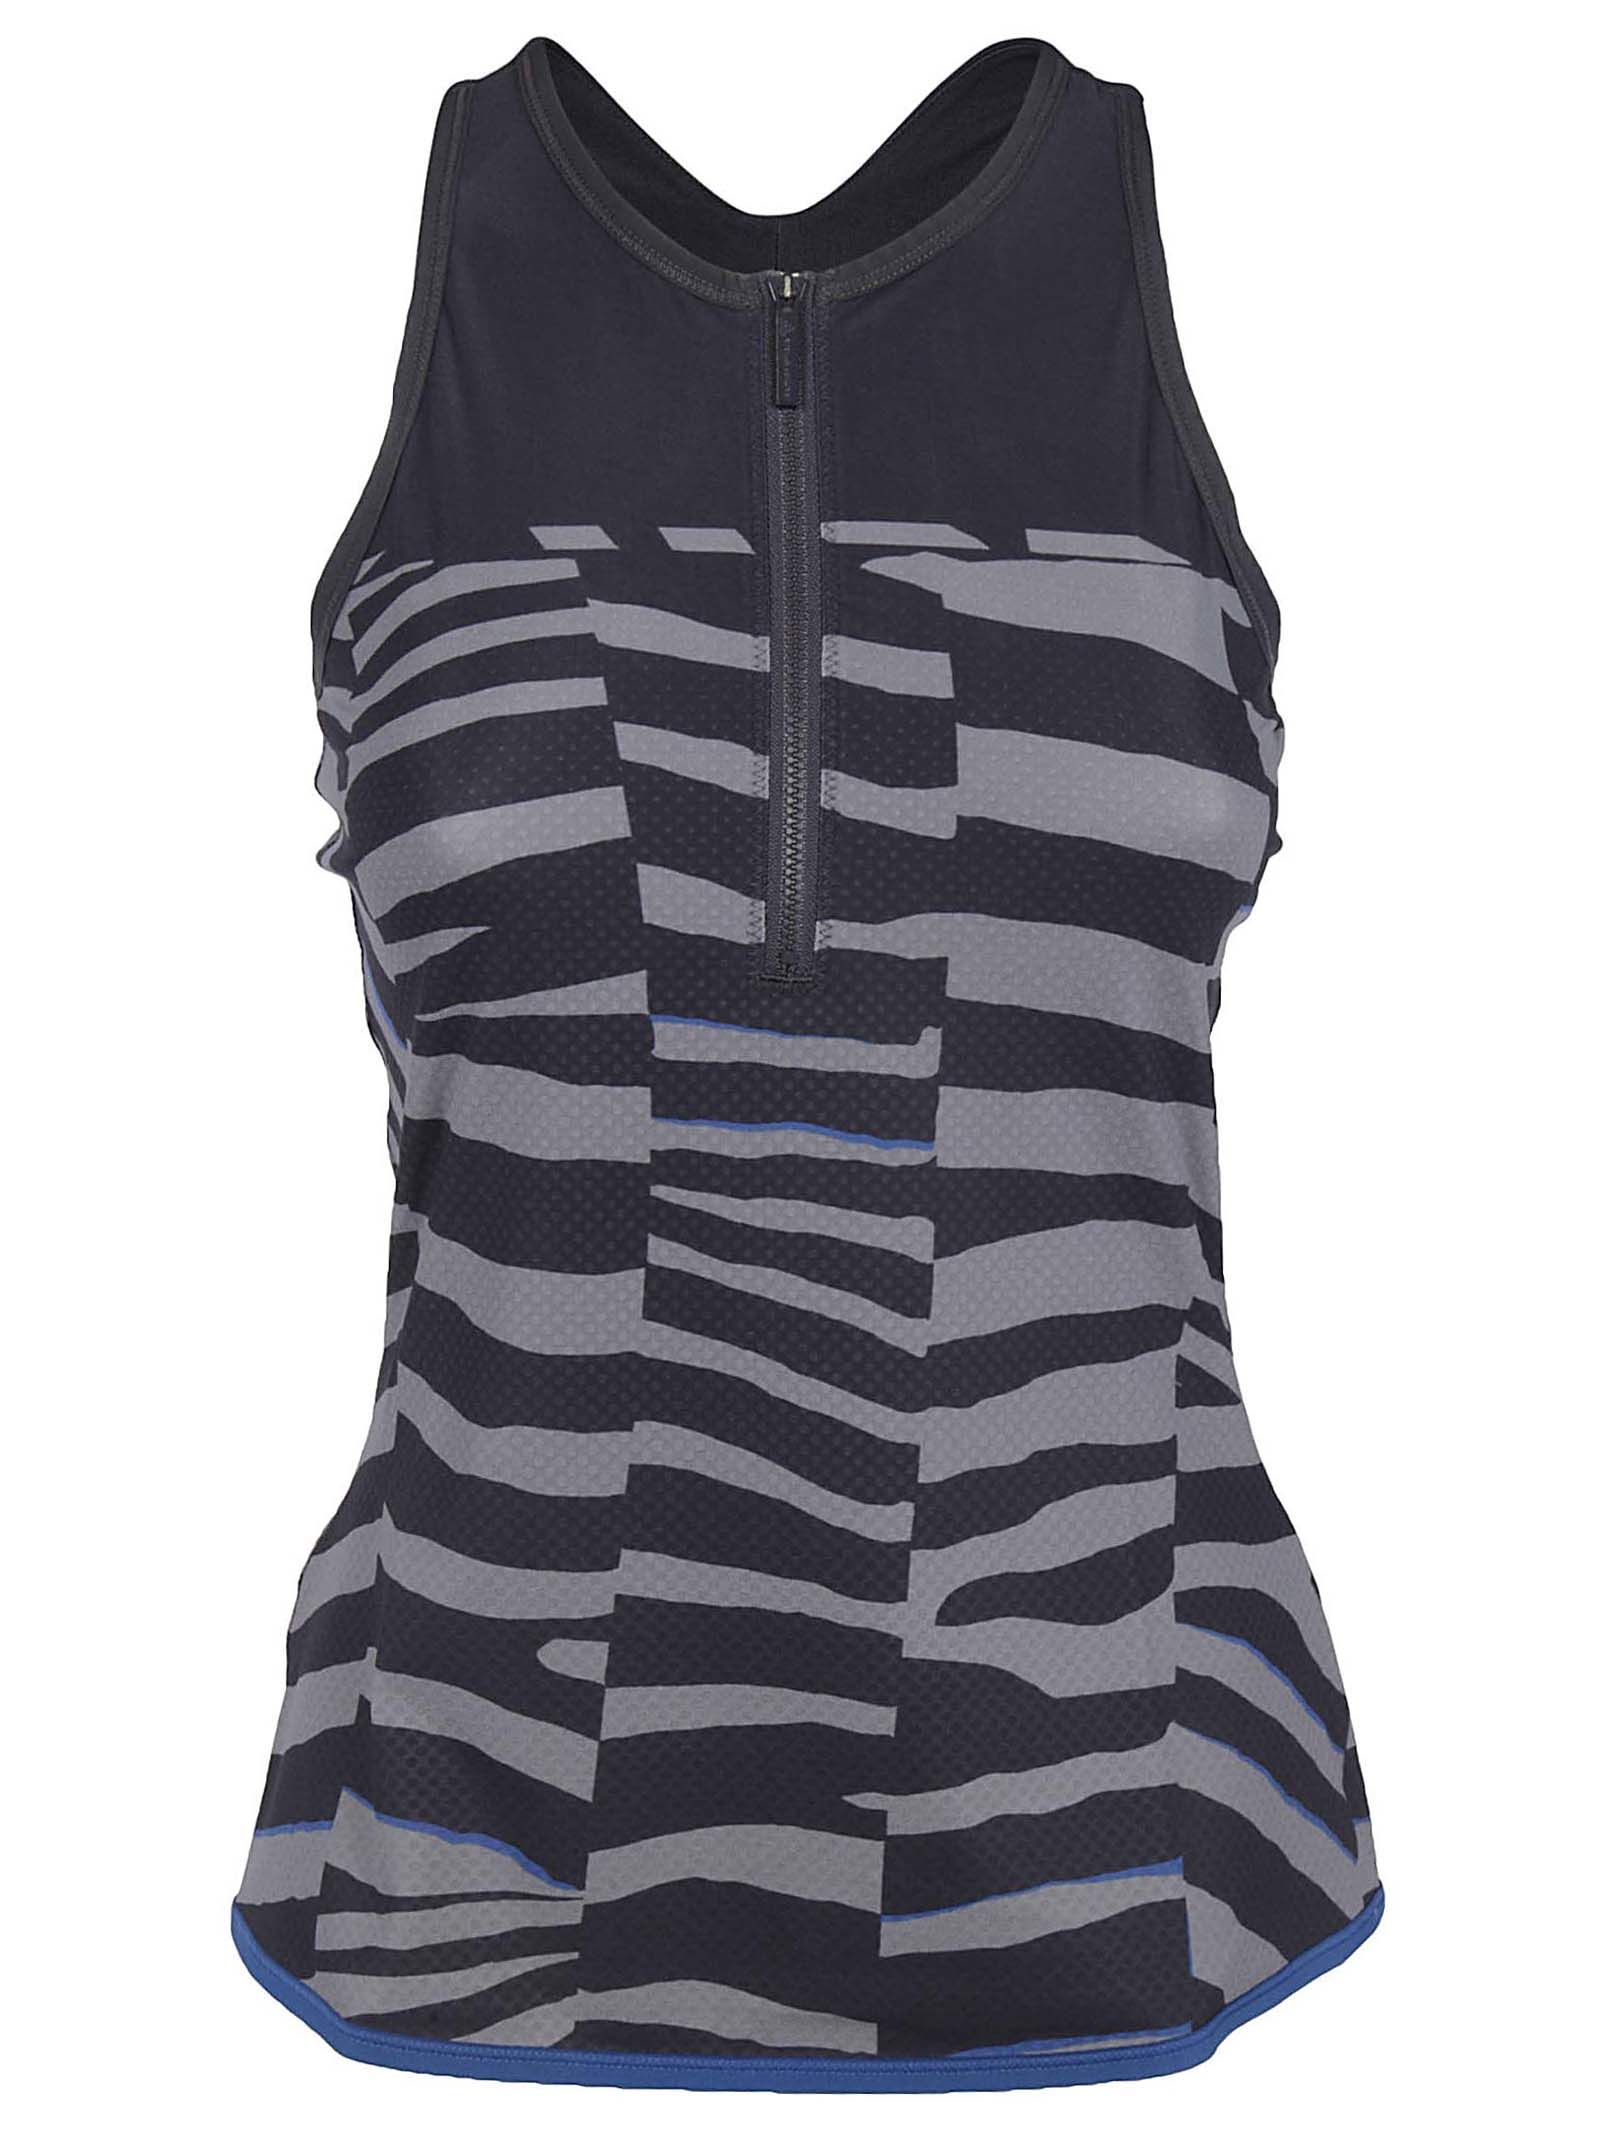 455267b721b Adidas by Stella McCartney Miracle Training Tank Top - Black Grey ...